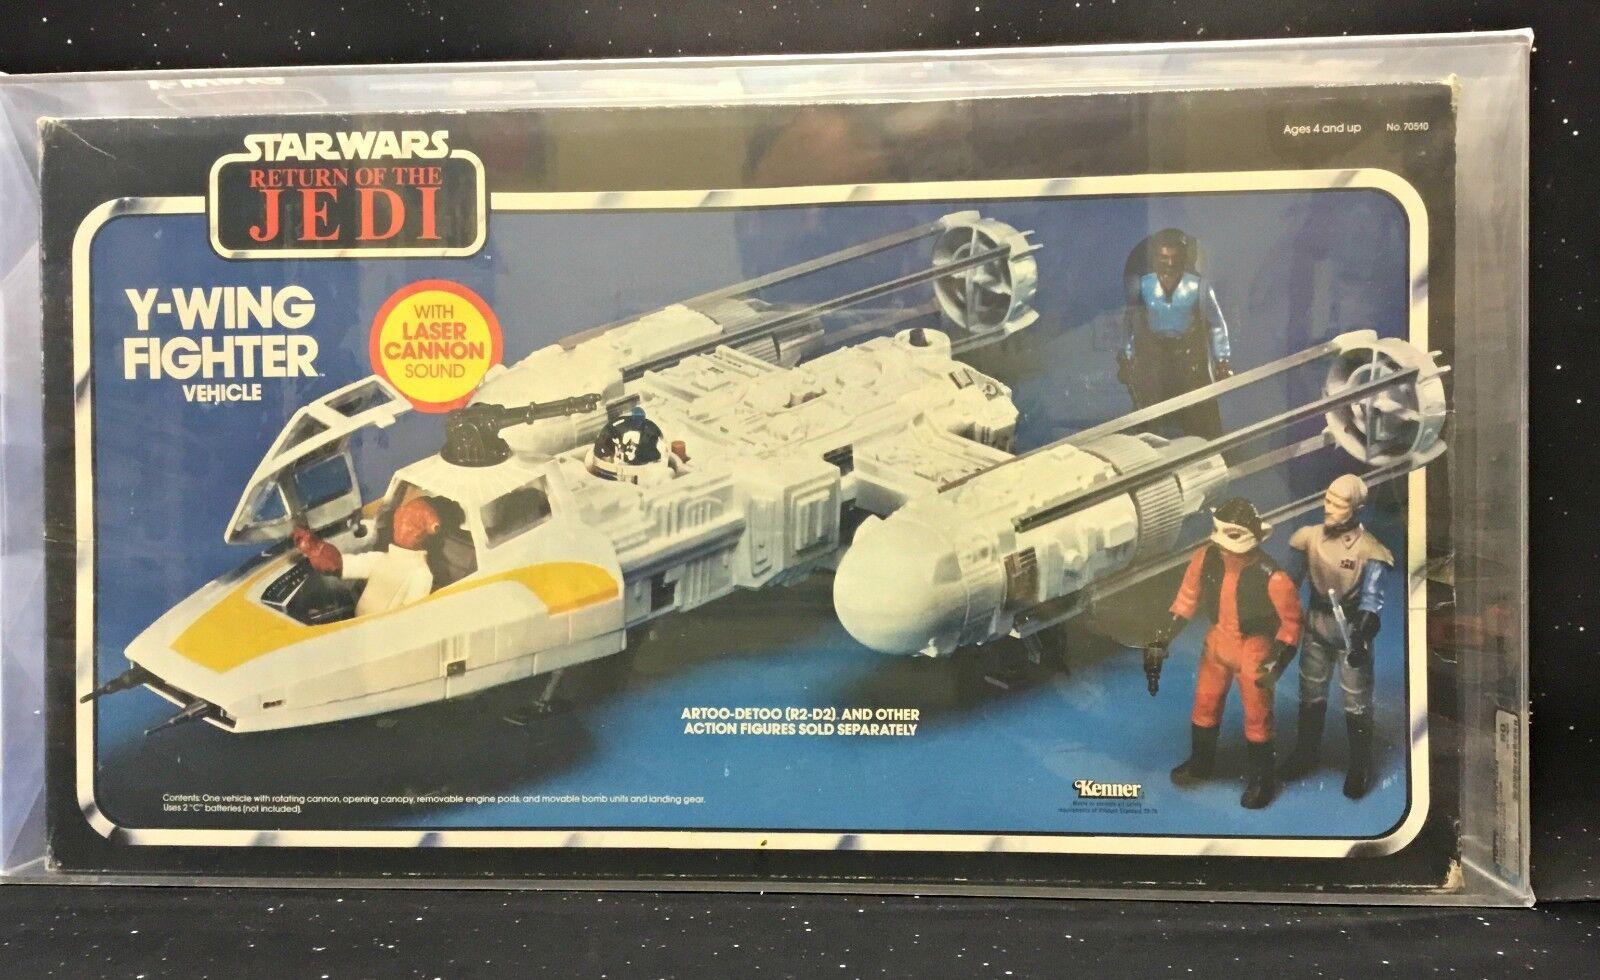 2018 Kenner Regreso Del Jedi De Star Wars Y-wing Fighter AFA QY-80